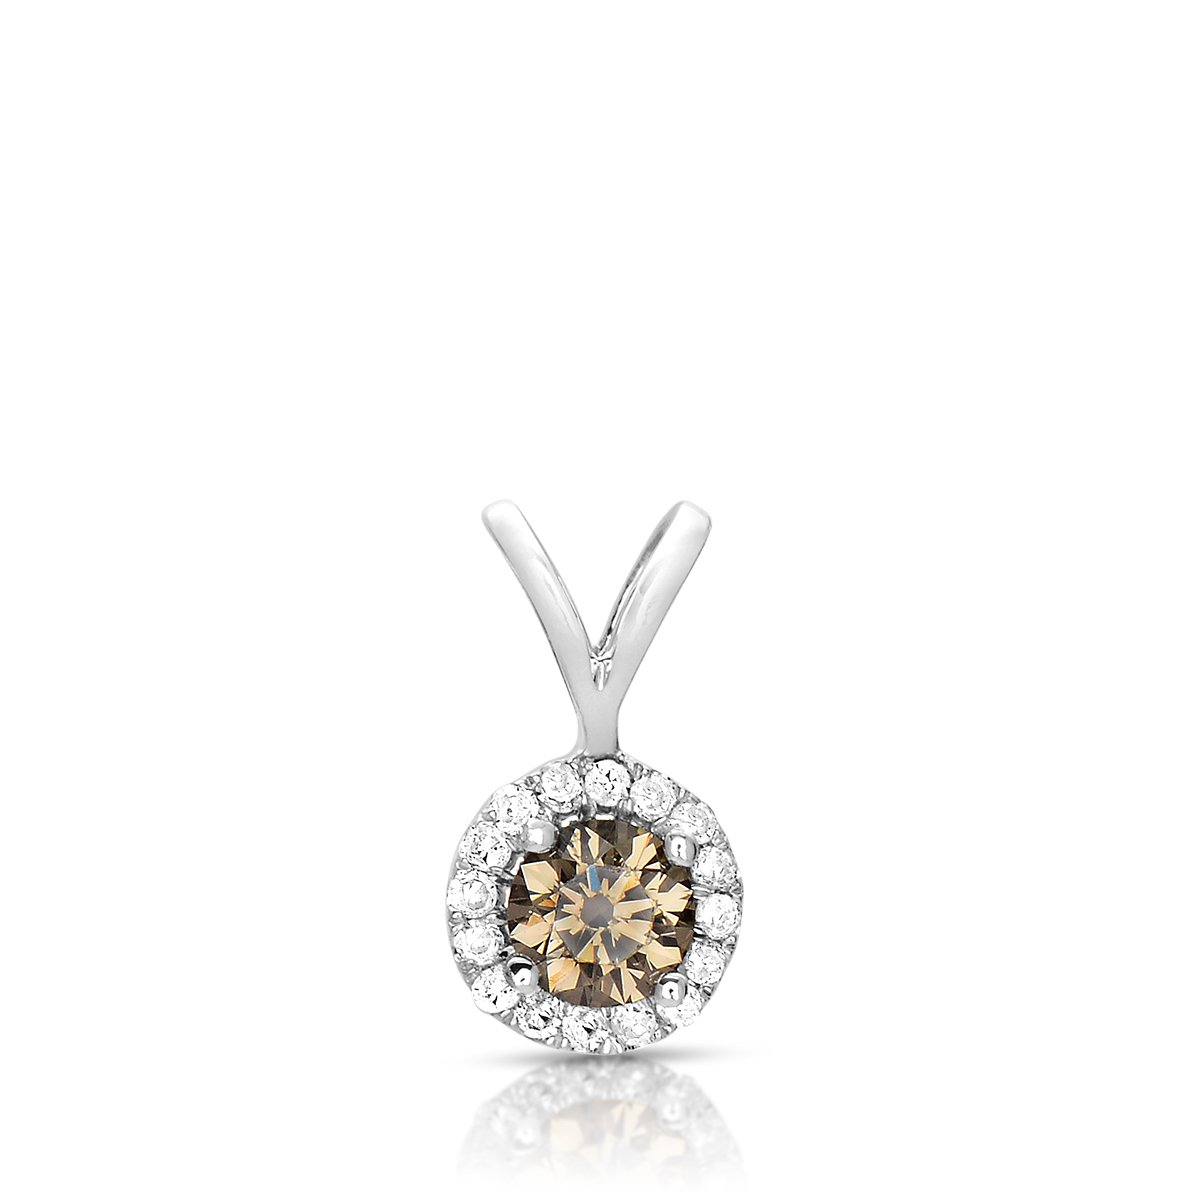 0.75 ct Chocolate Brown Diamond Halo 14k White Gold Pendant Necklace Set (K1295-075WBR)